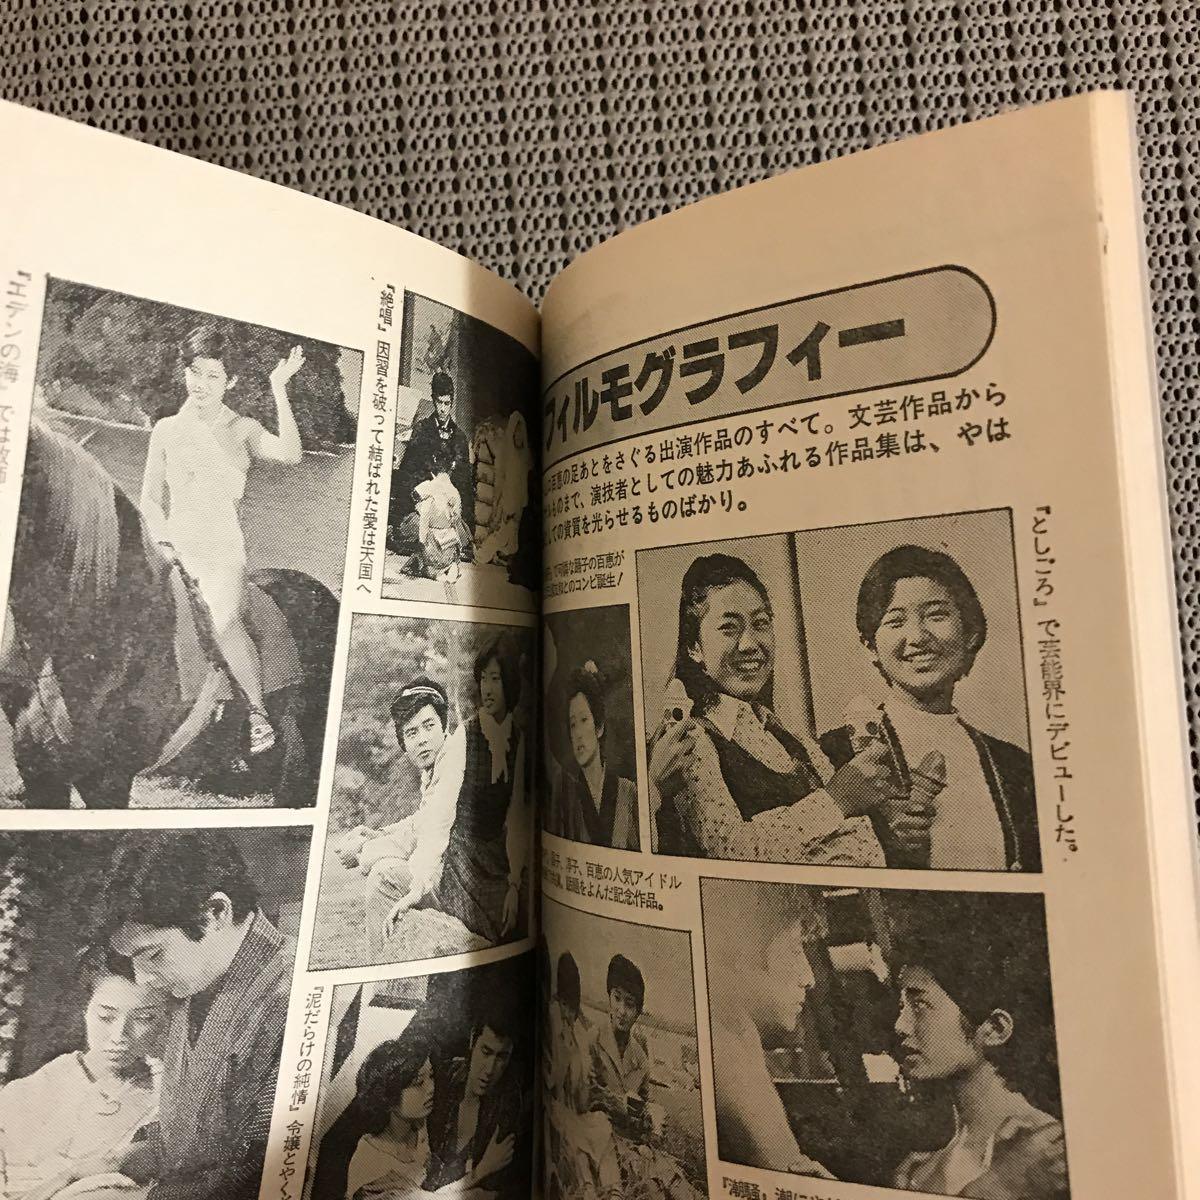 MOMOE 山口百恵・20歳の手帳 近代映画附録/昭和54年5月号 状態良好です_画像10